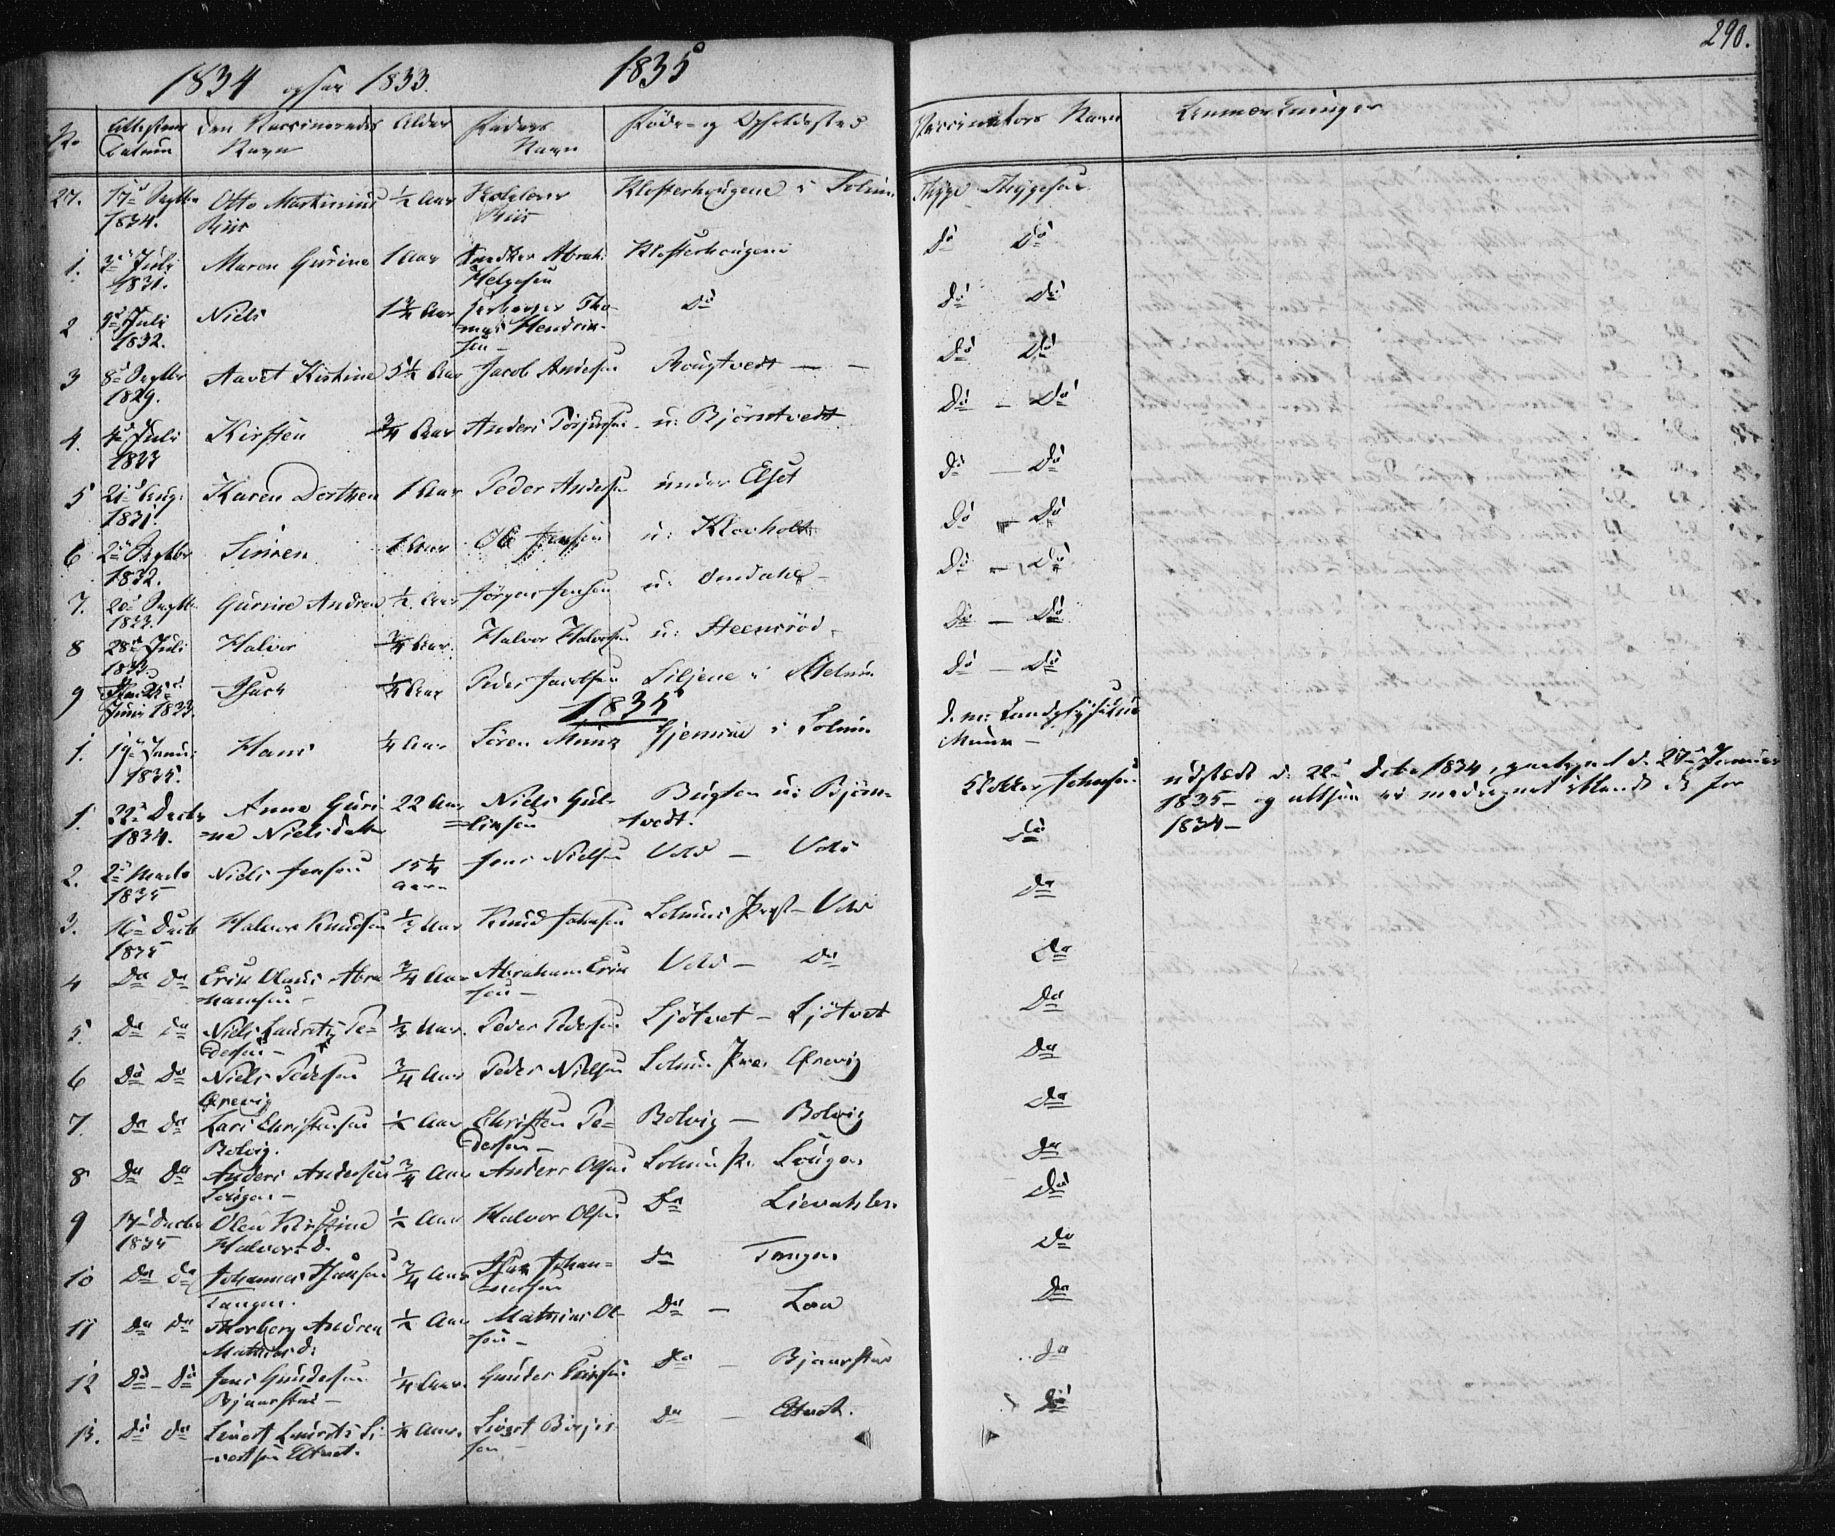 SAKO, Solum kirkebøker, F/Fa/L0005: Ministerialbok nr. I 5, 1833-1843, s. 290